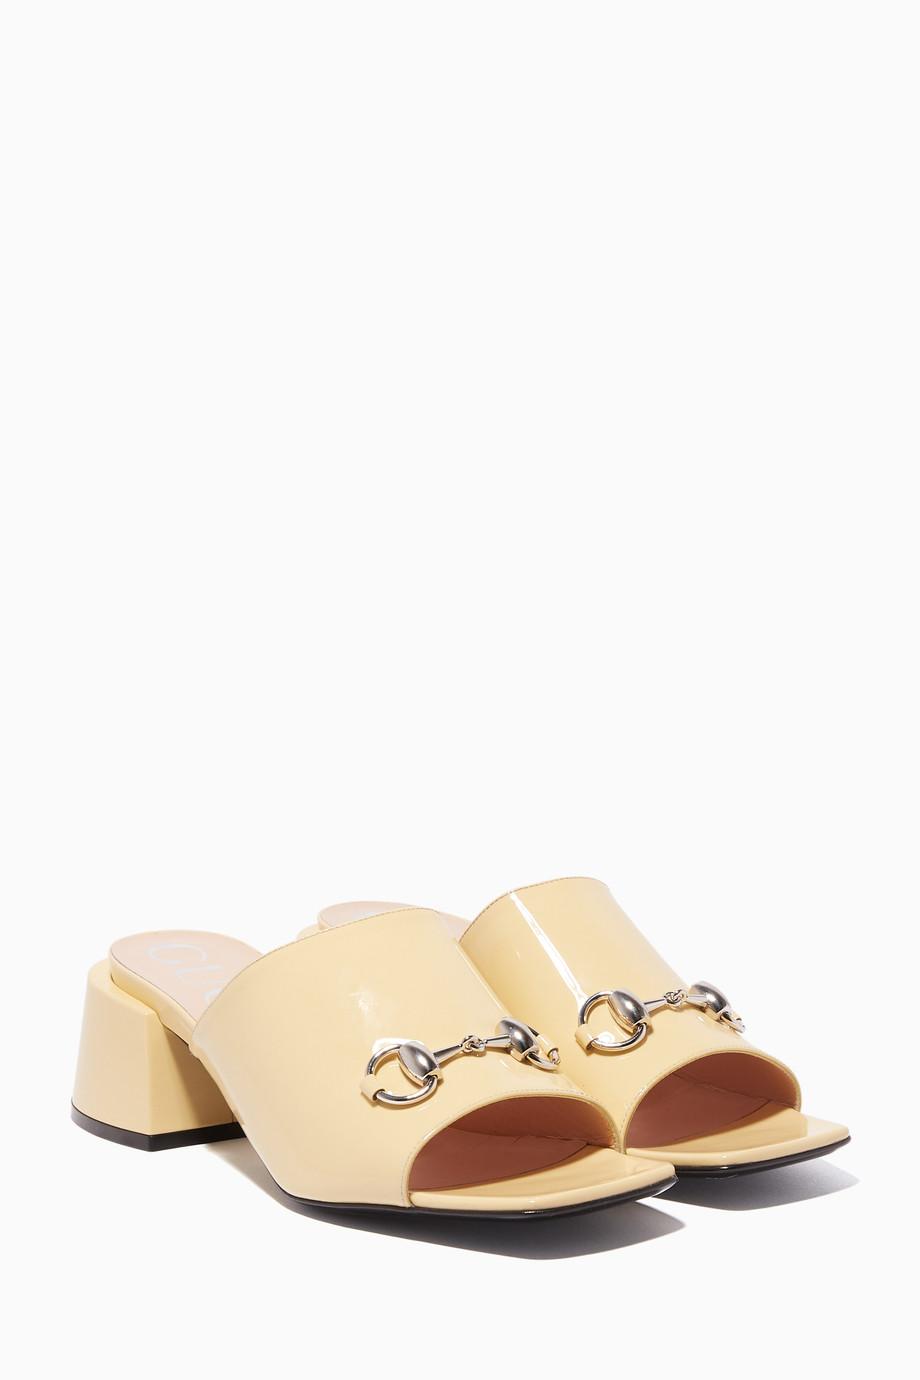 baf50b0bf78 Shop Gucci Neutral Cream Patent Mid-Heel Slides for Women